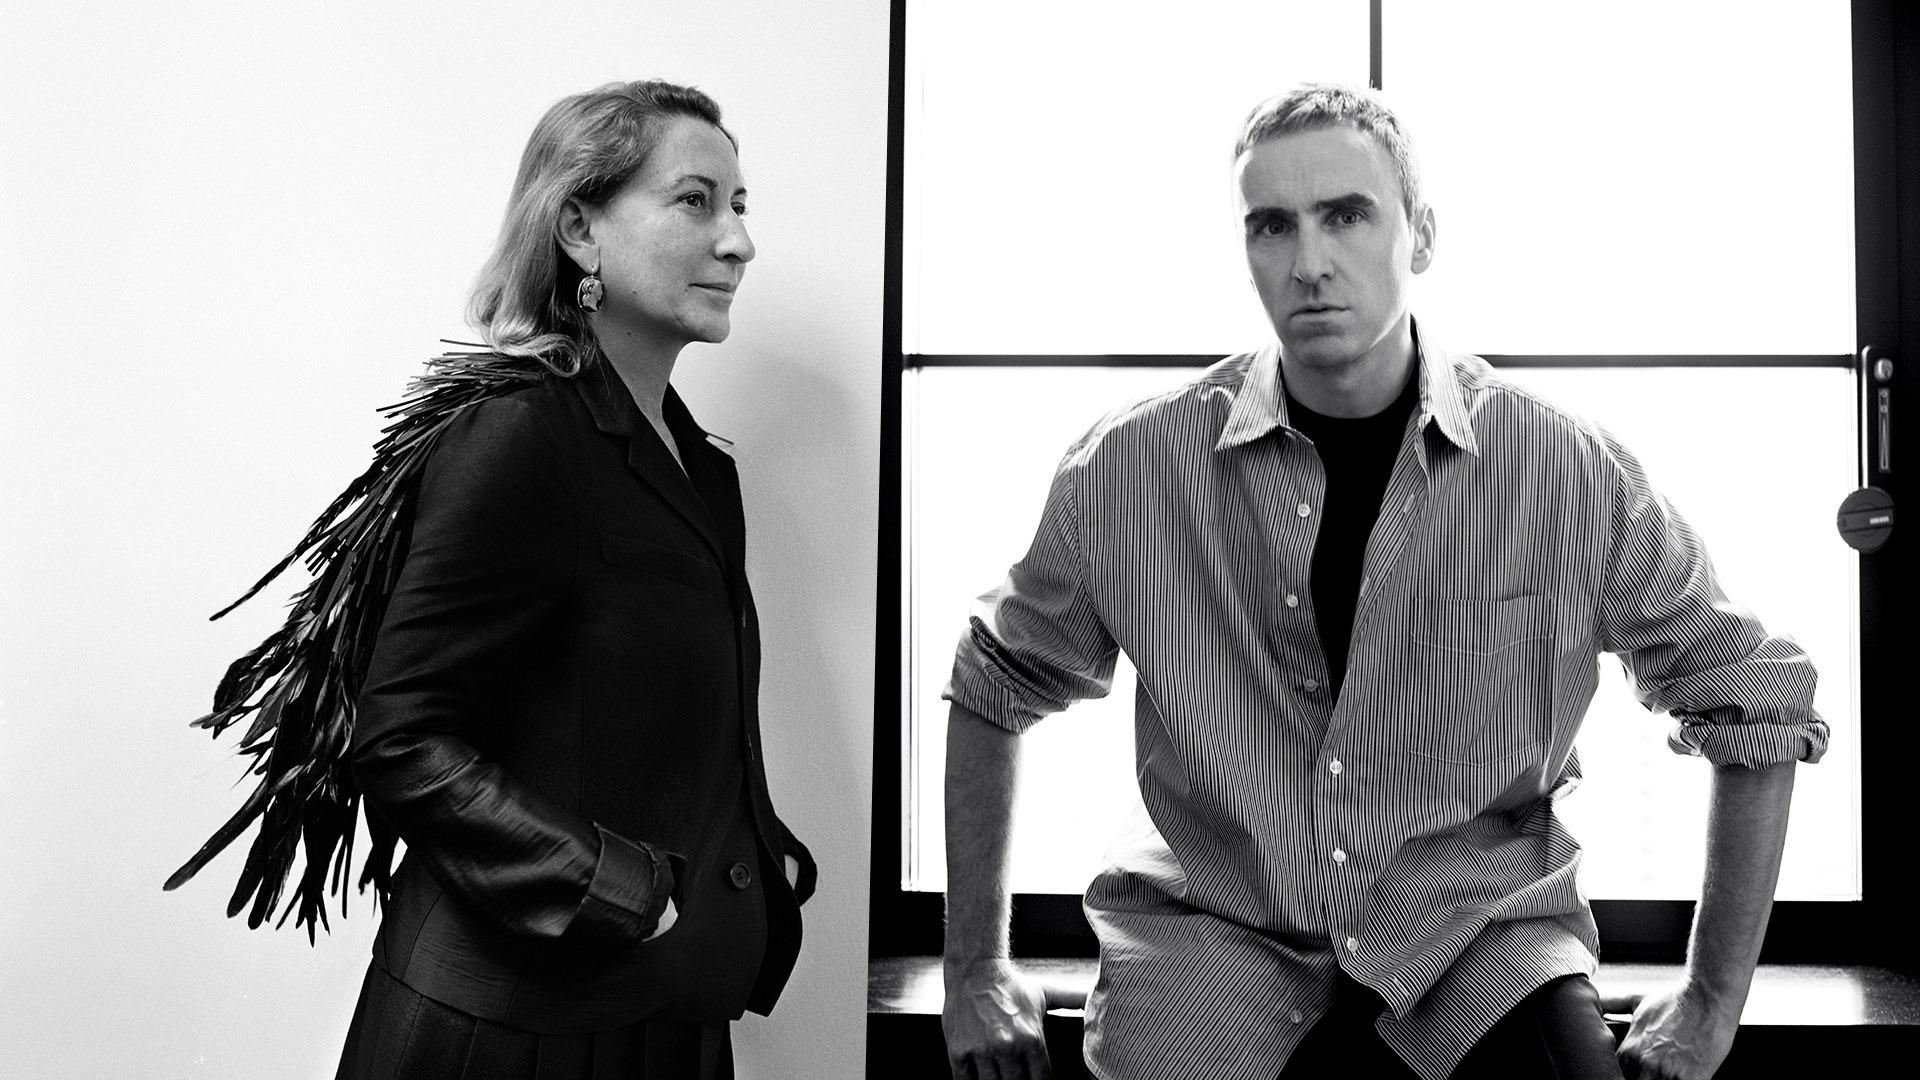 Raf Simons is the New Creative Director of Prada!